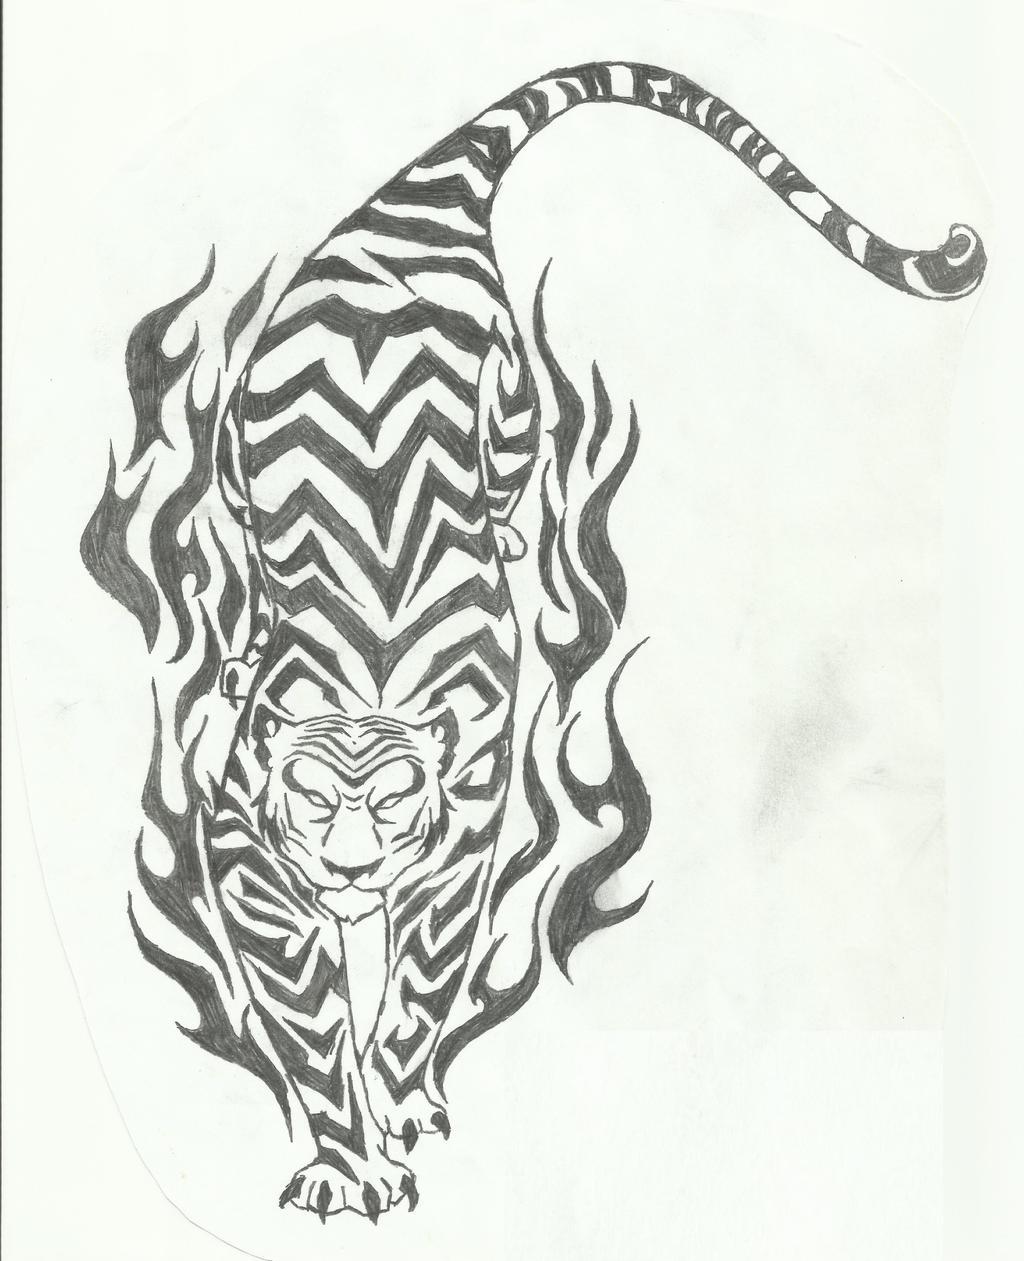 Tribal Tiger By Ruttan On Deviantart: Tribal Tiger By YukiSnowDevil On DeviantART